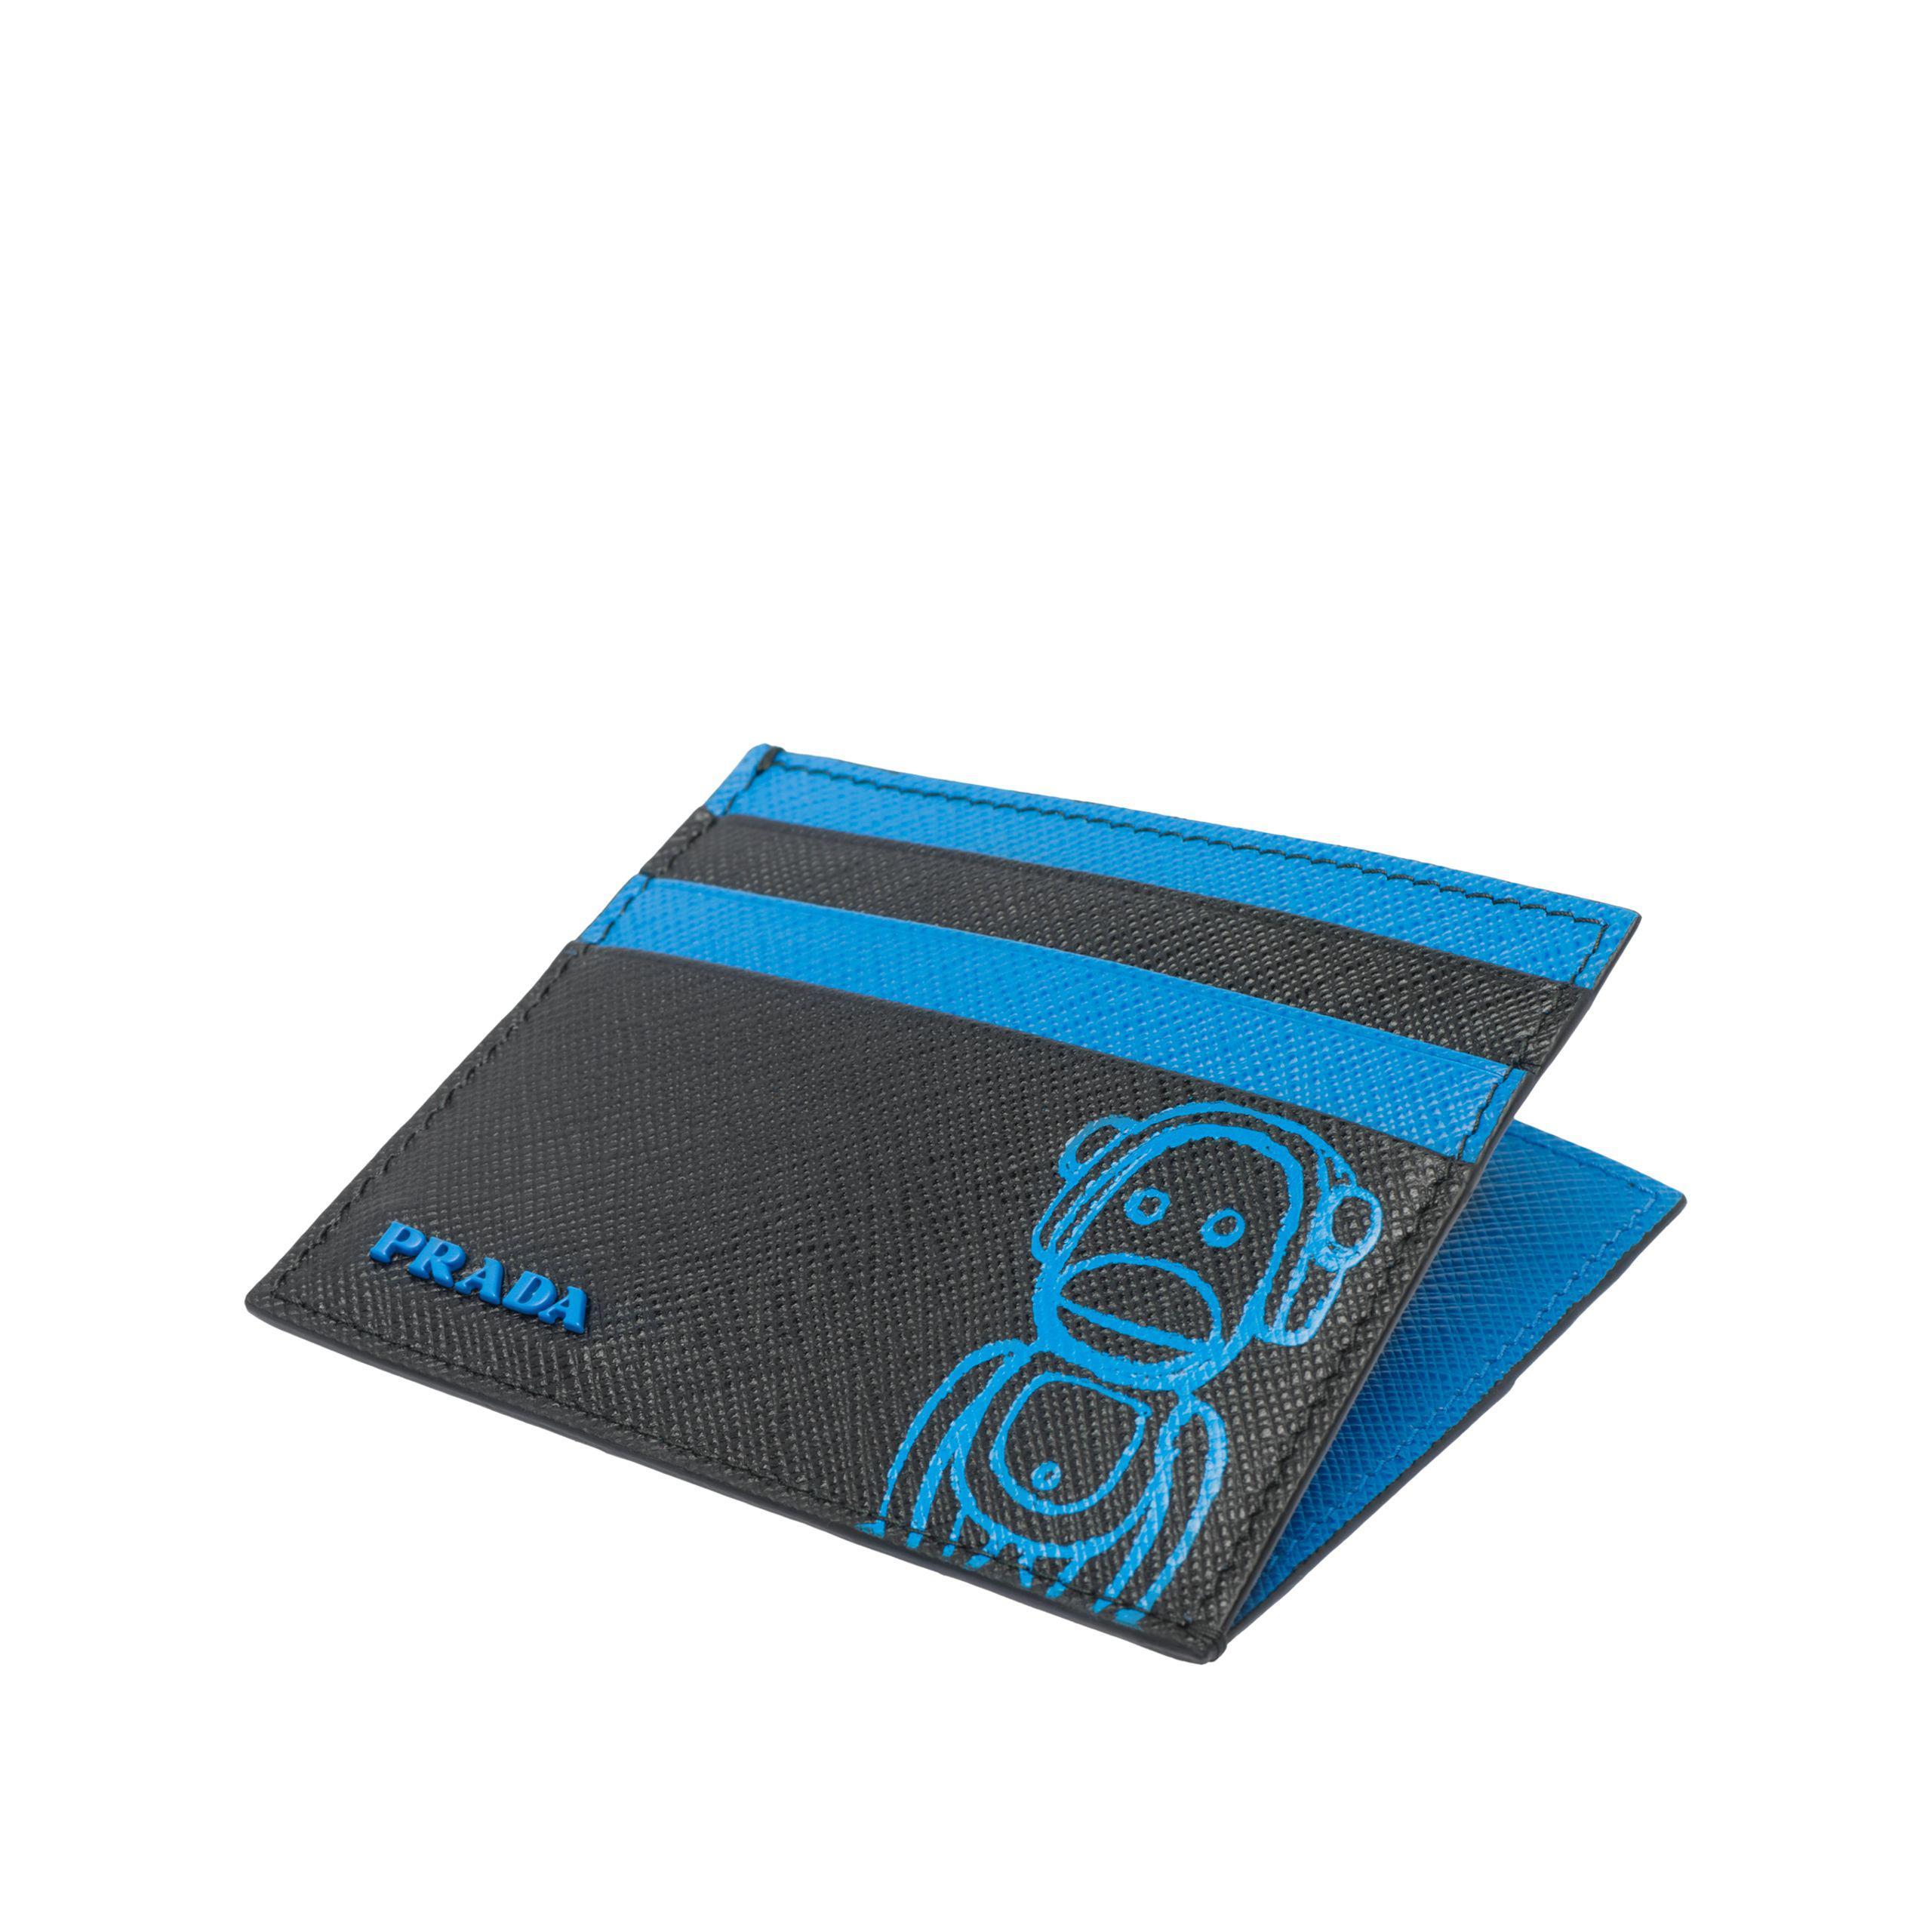 Prada Malia Saffiano Leather Card Holder in Blue for Men - Lyst